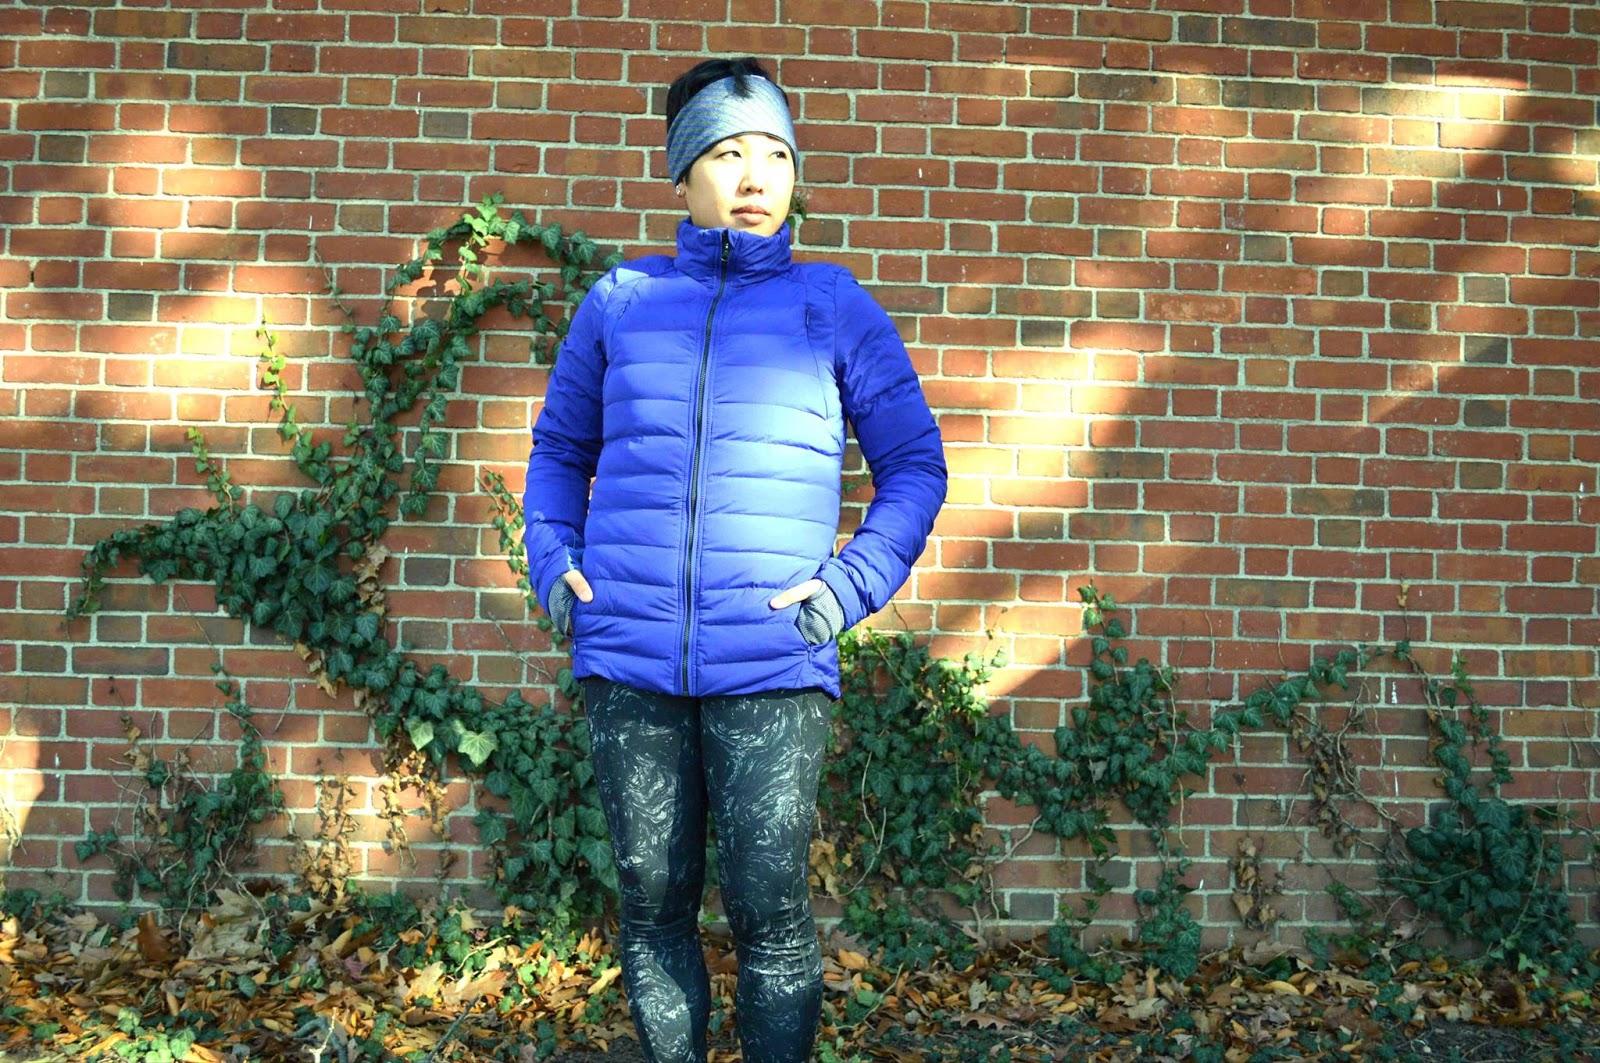 lululemon-arsenal-ambient-speed-tights fluffed-up-jacket